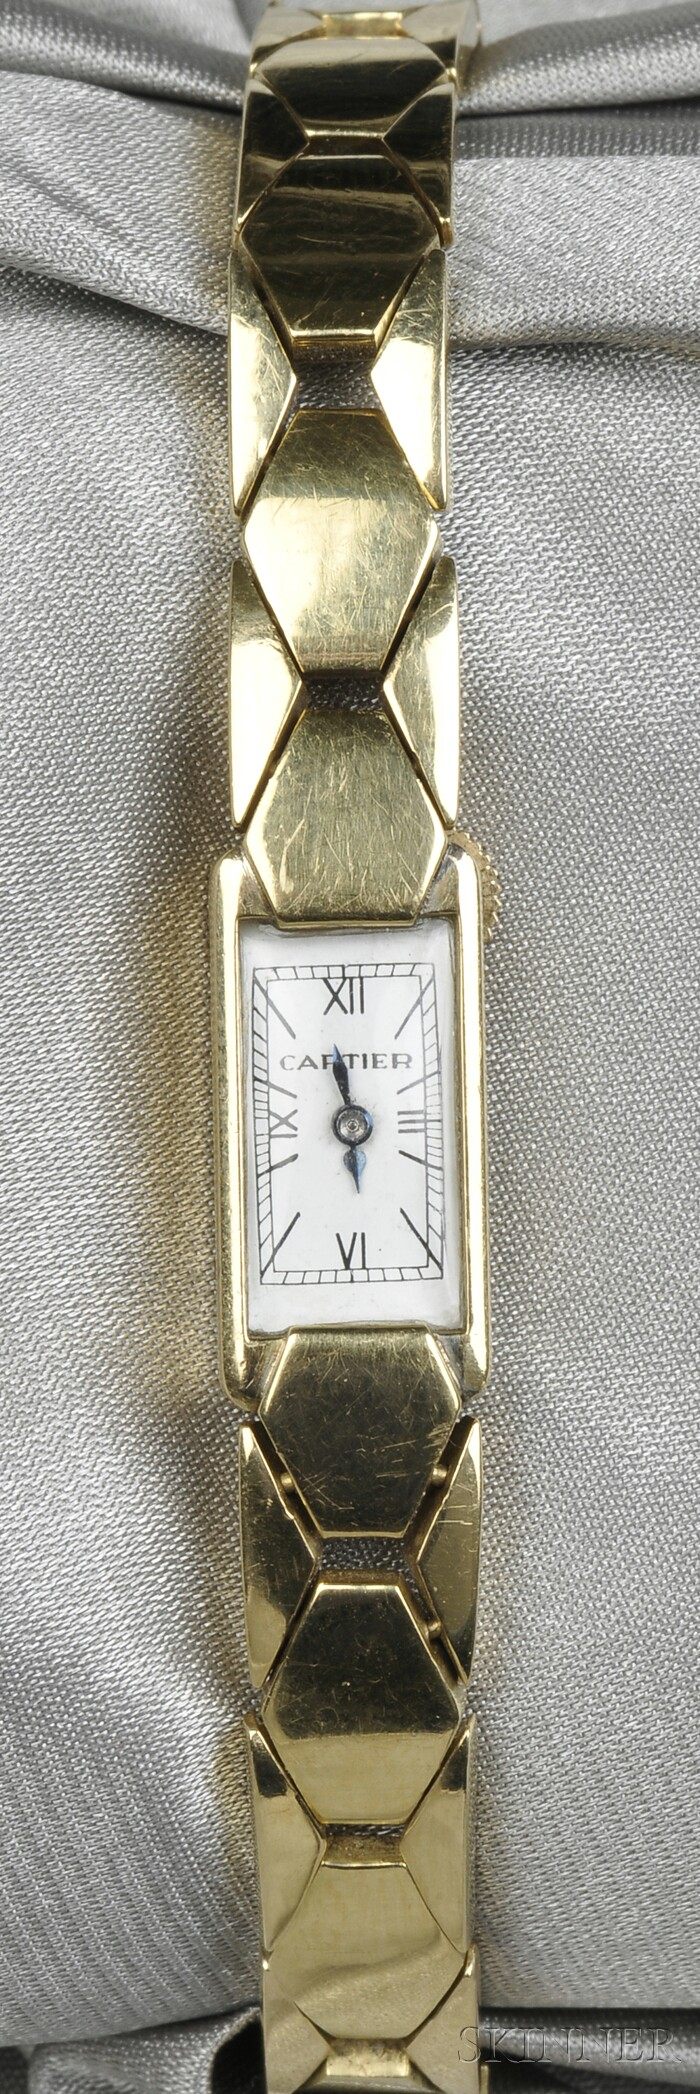 Lady's 18kt Gold Wristwatch, Cartier, France